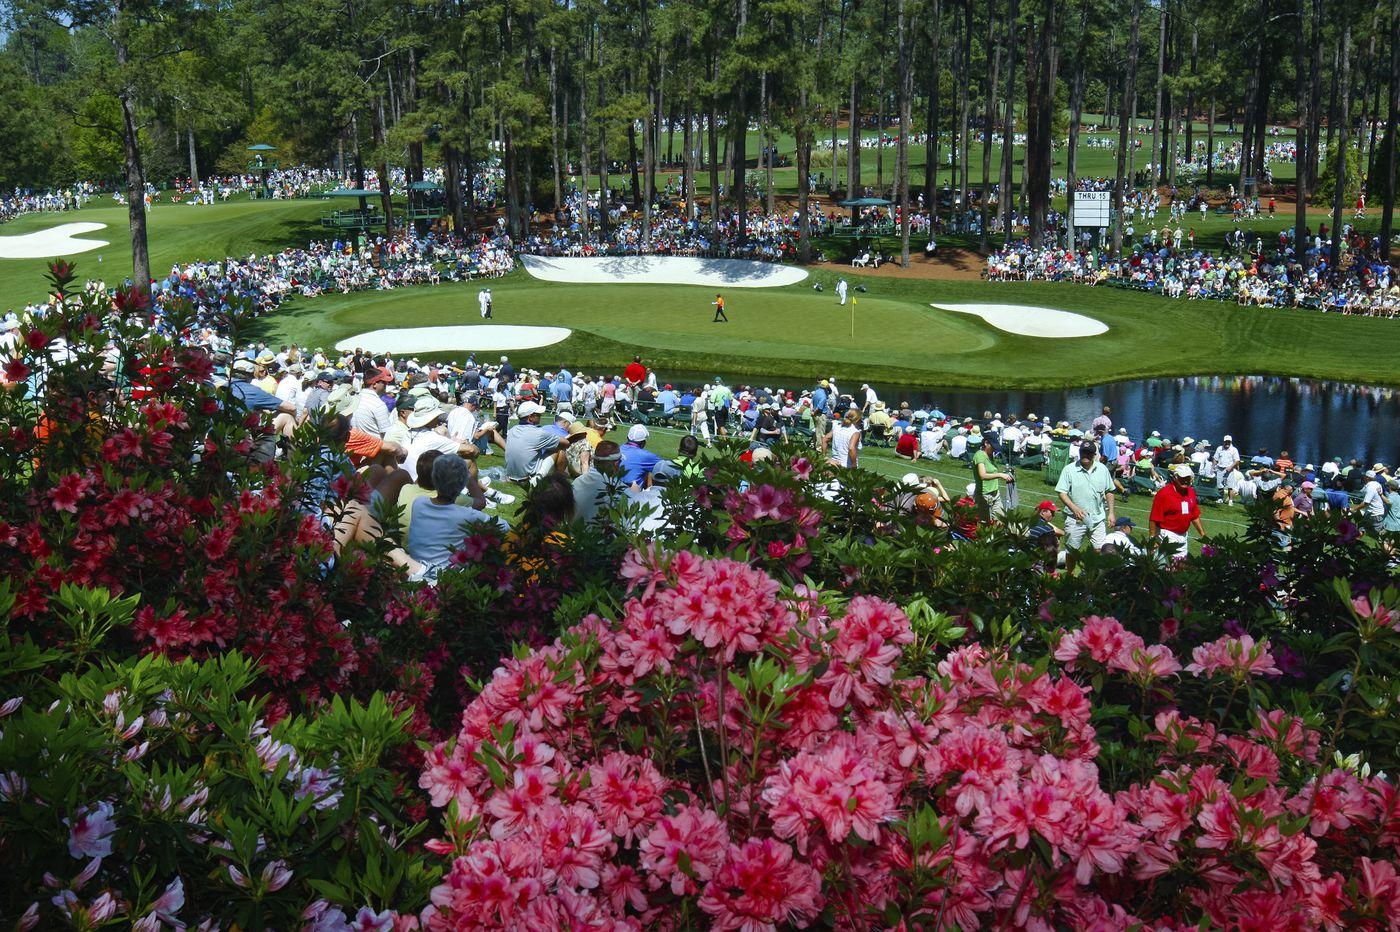 Masters tournament, golf's first major of 2020, postponed because of coronavirus